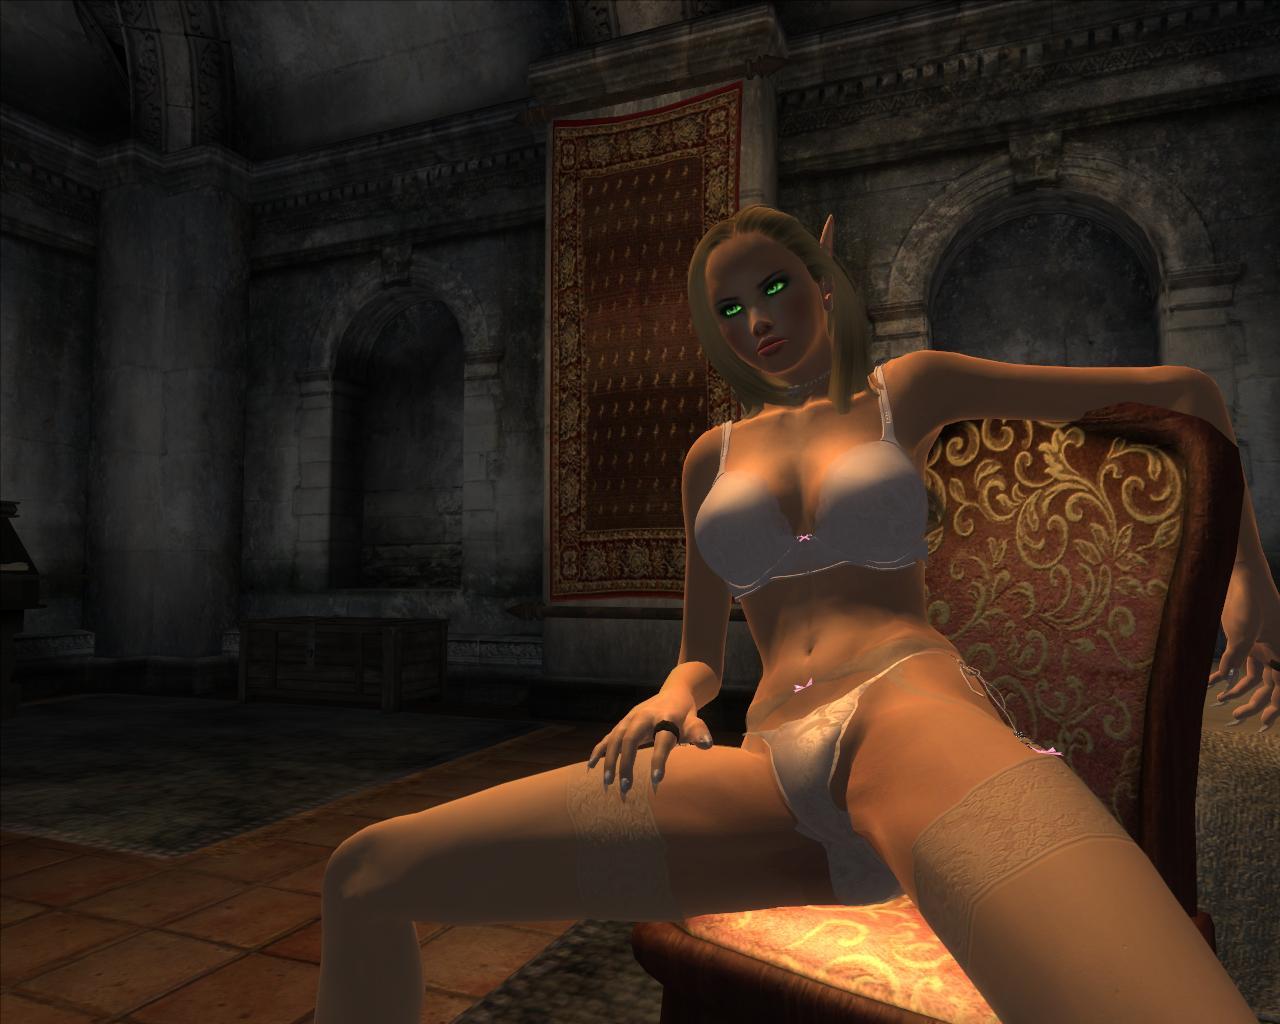 oblivion-eroticheskie-rasi